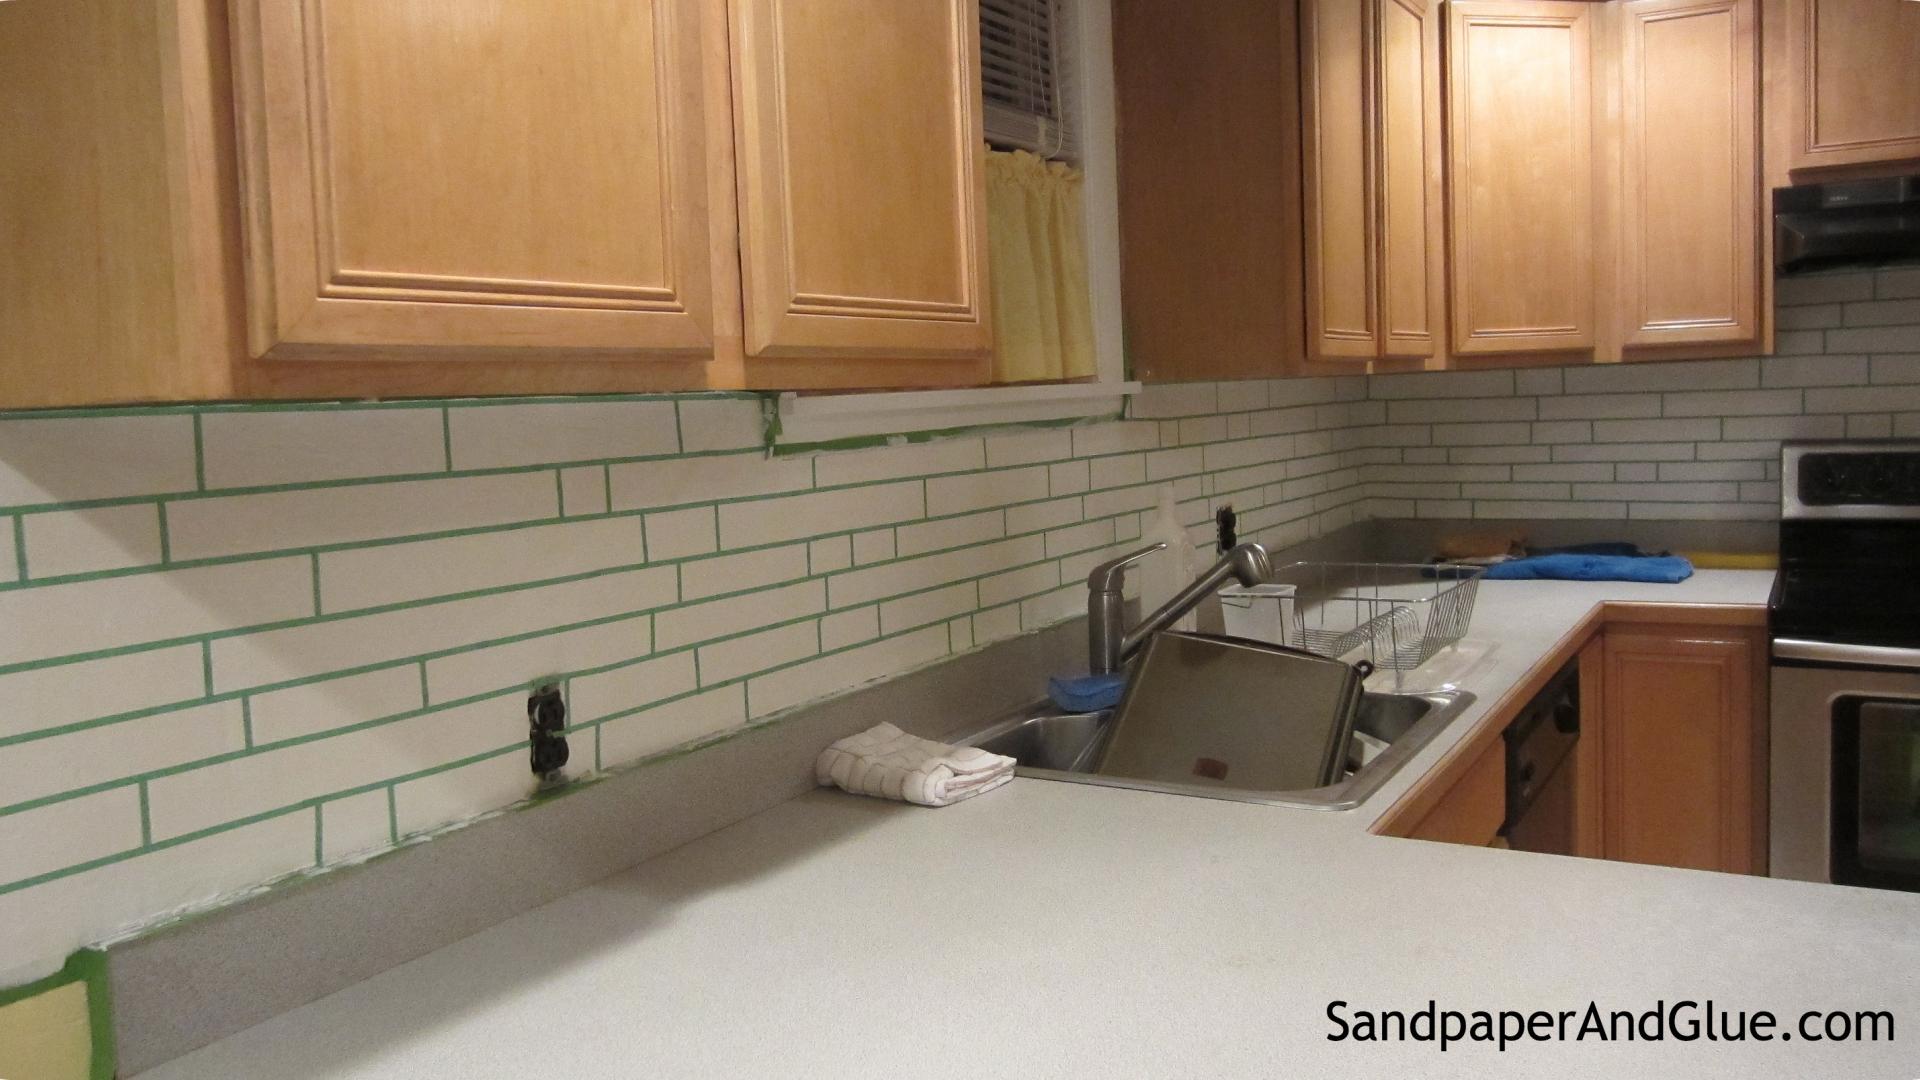 - Free Download DIY Faux Tile Backsplash Stephanie Marchetti